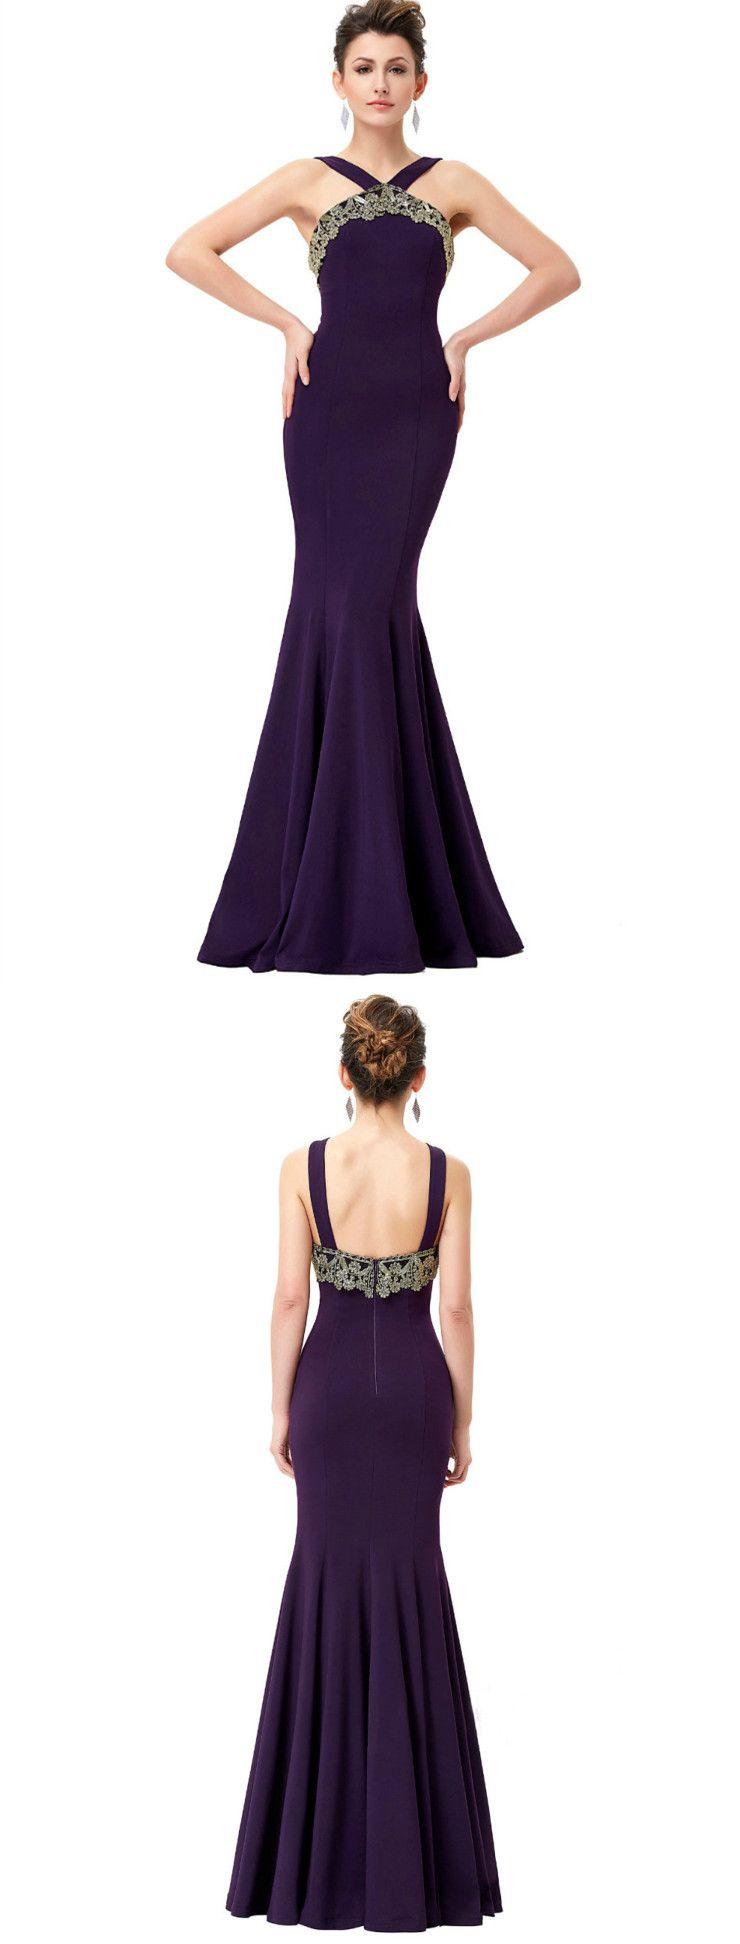 Mermaid halter floorlength satin purple long prom dresses